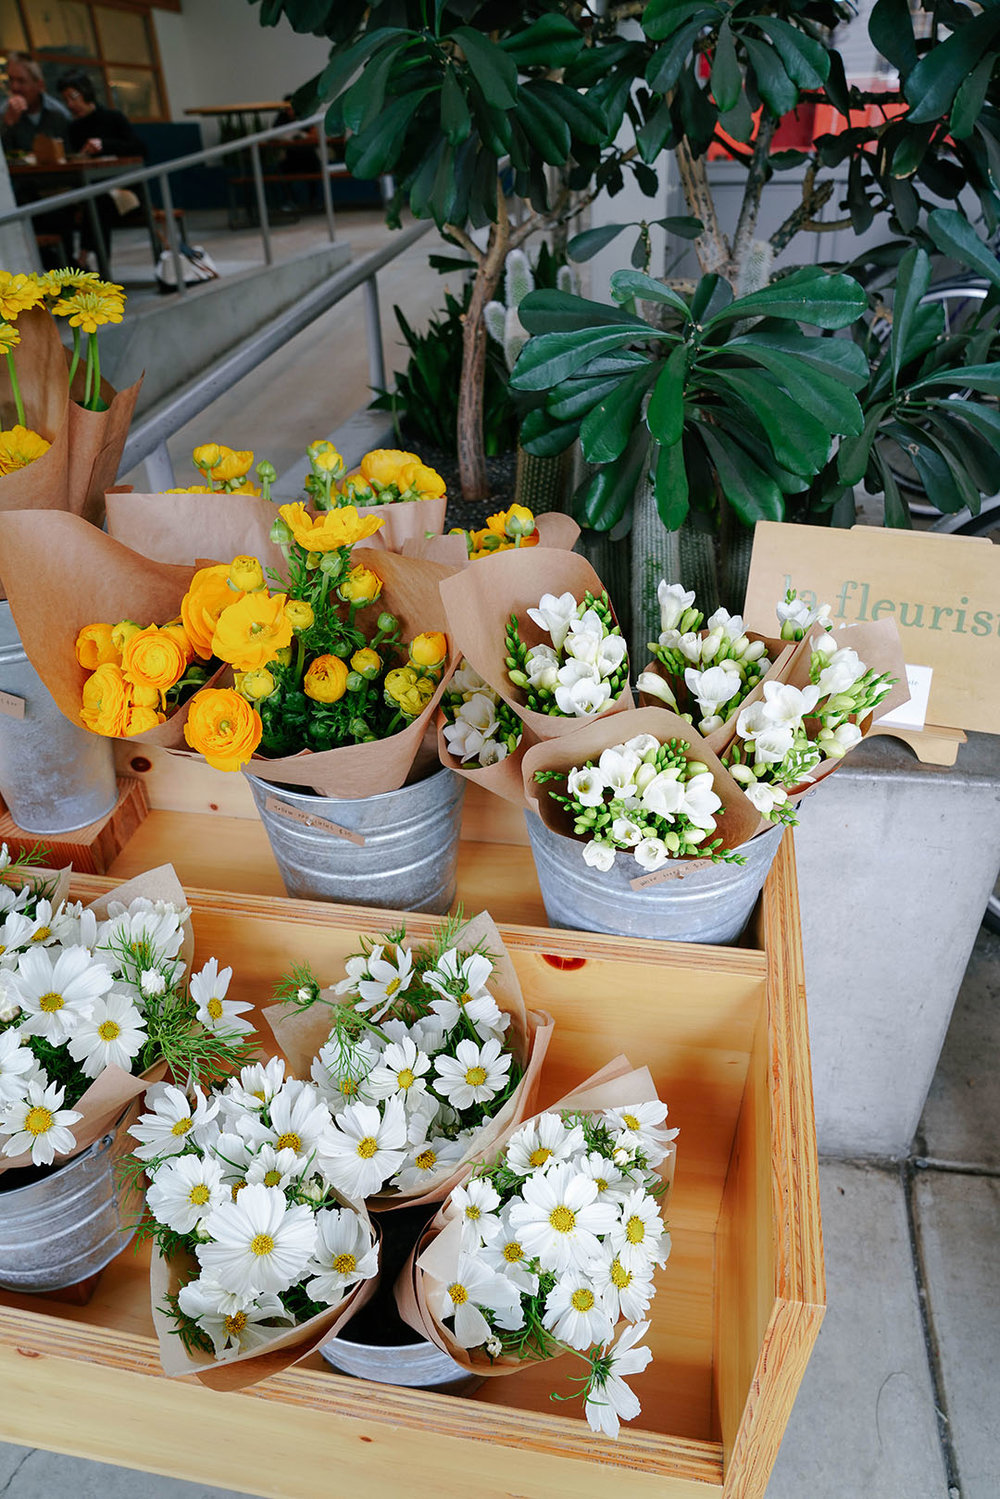 La Fleuriste  at Heath